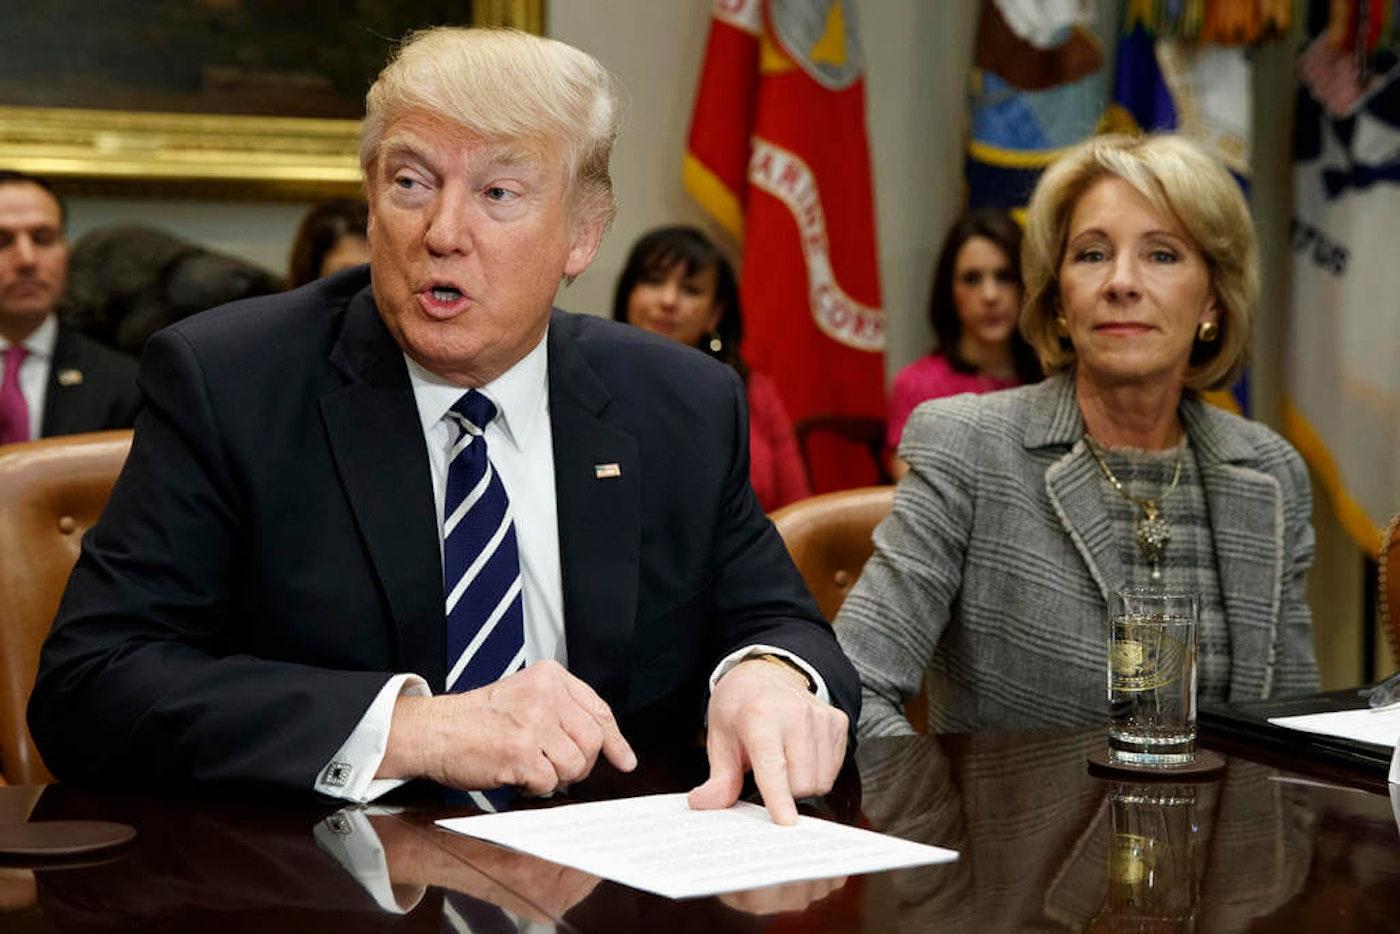 President Donald Trump accompanied by Education Secretary Betsy DeVos. (AP Photo/Evan Vucci)